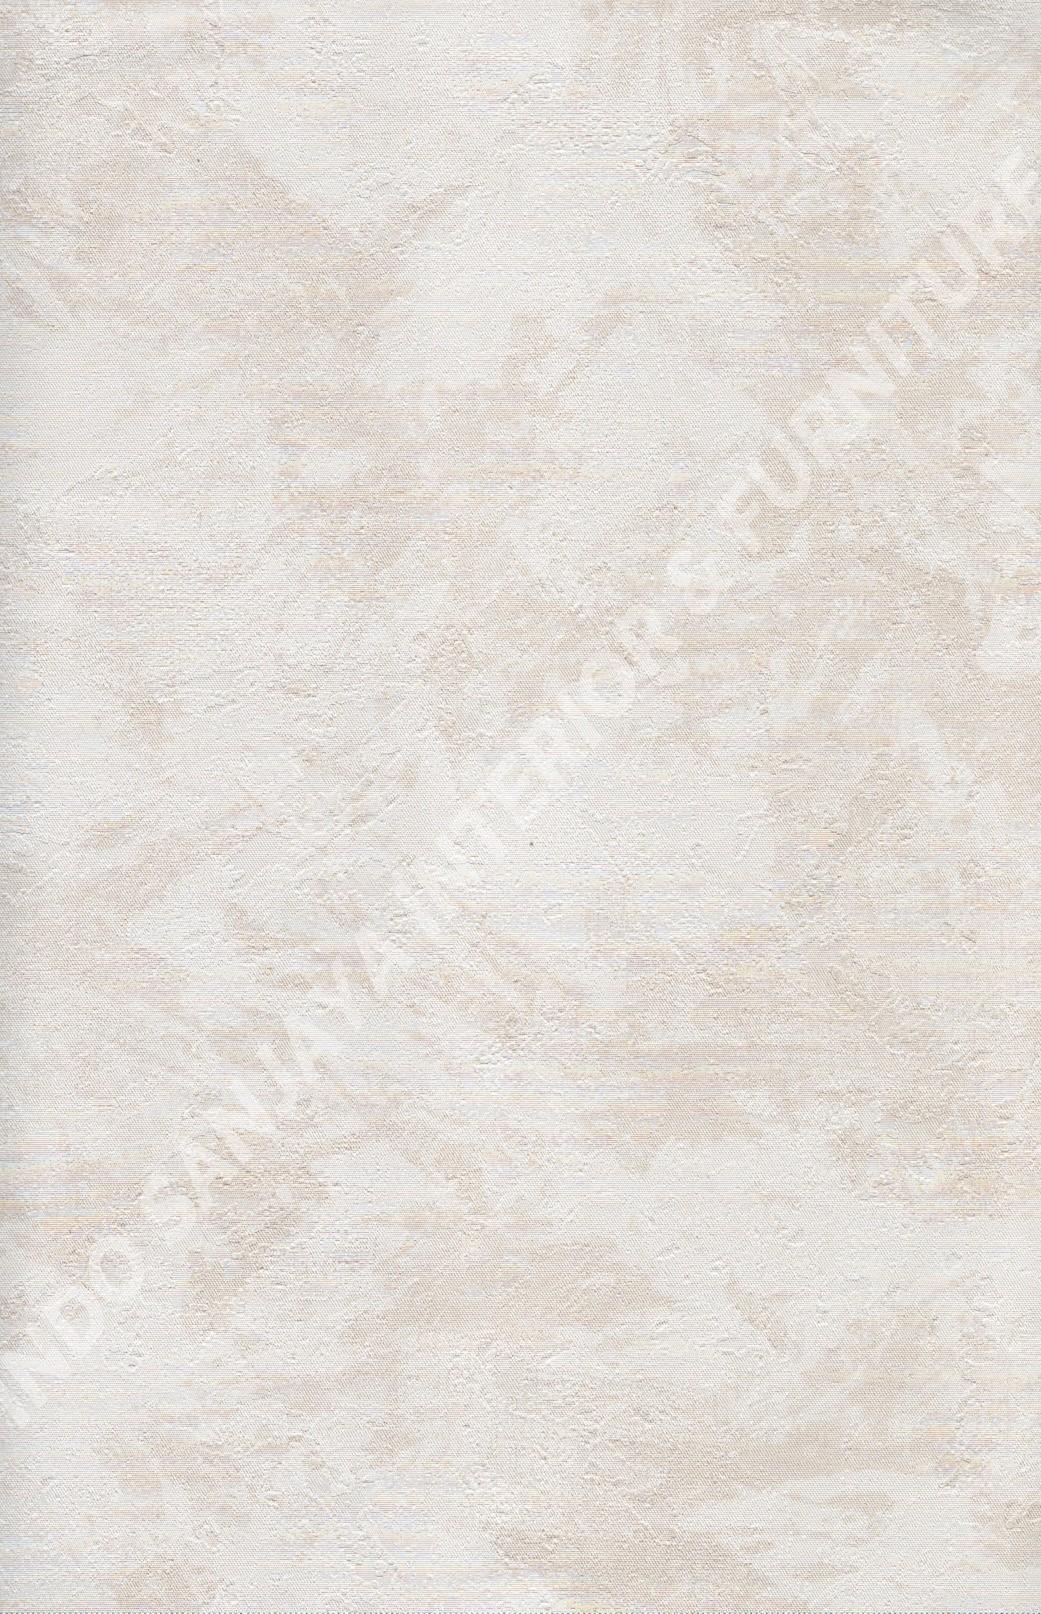 wallpaper   Wallpaper Minimalis Polos 81081-2:81081-2 corak  warna